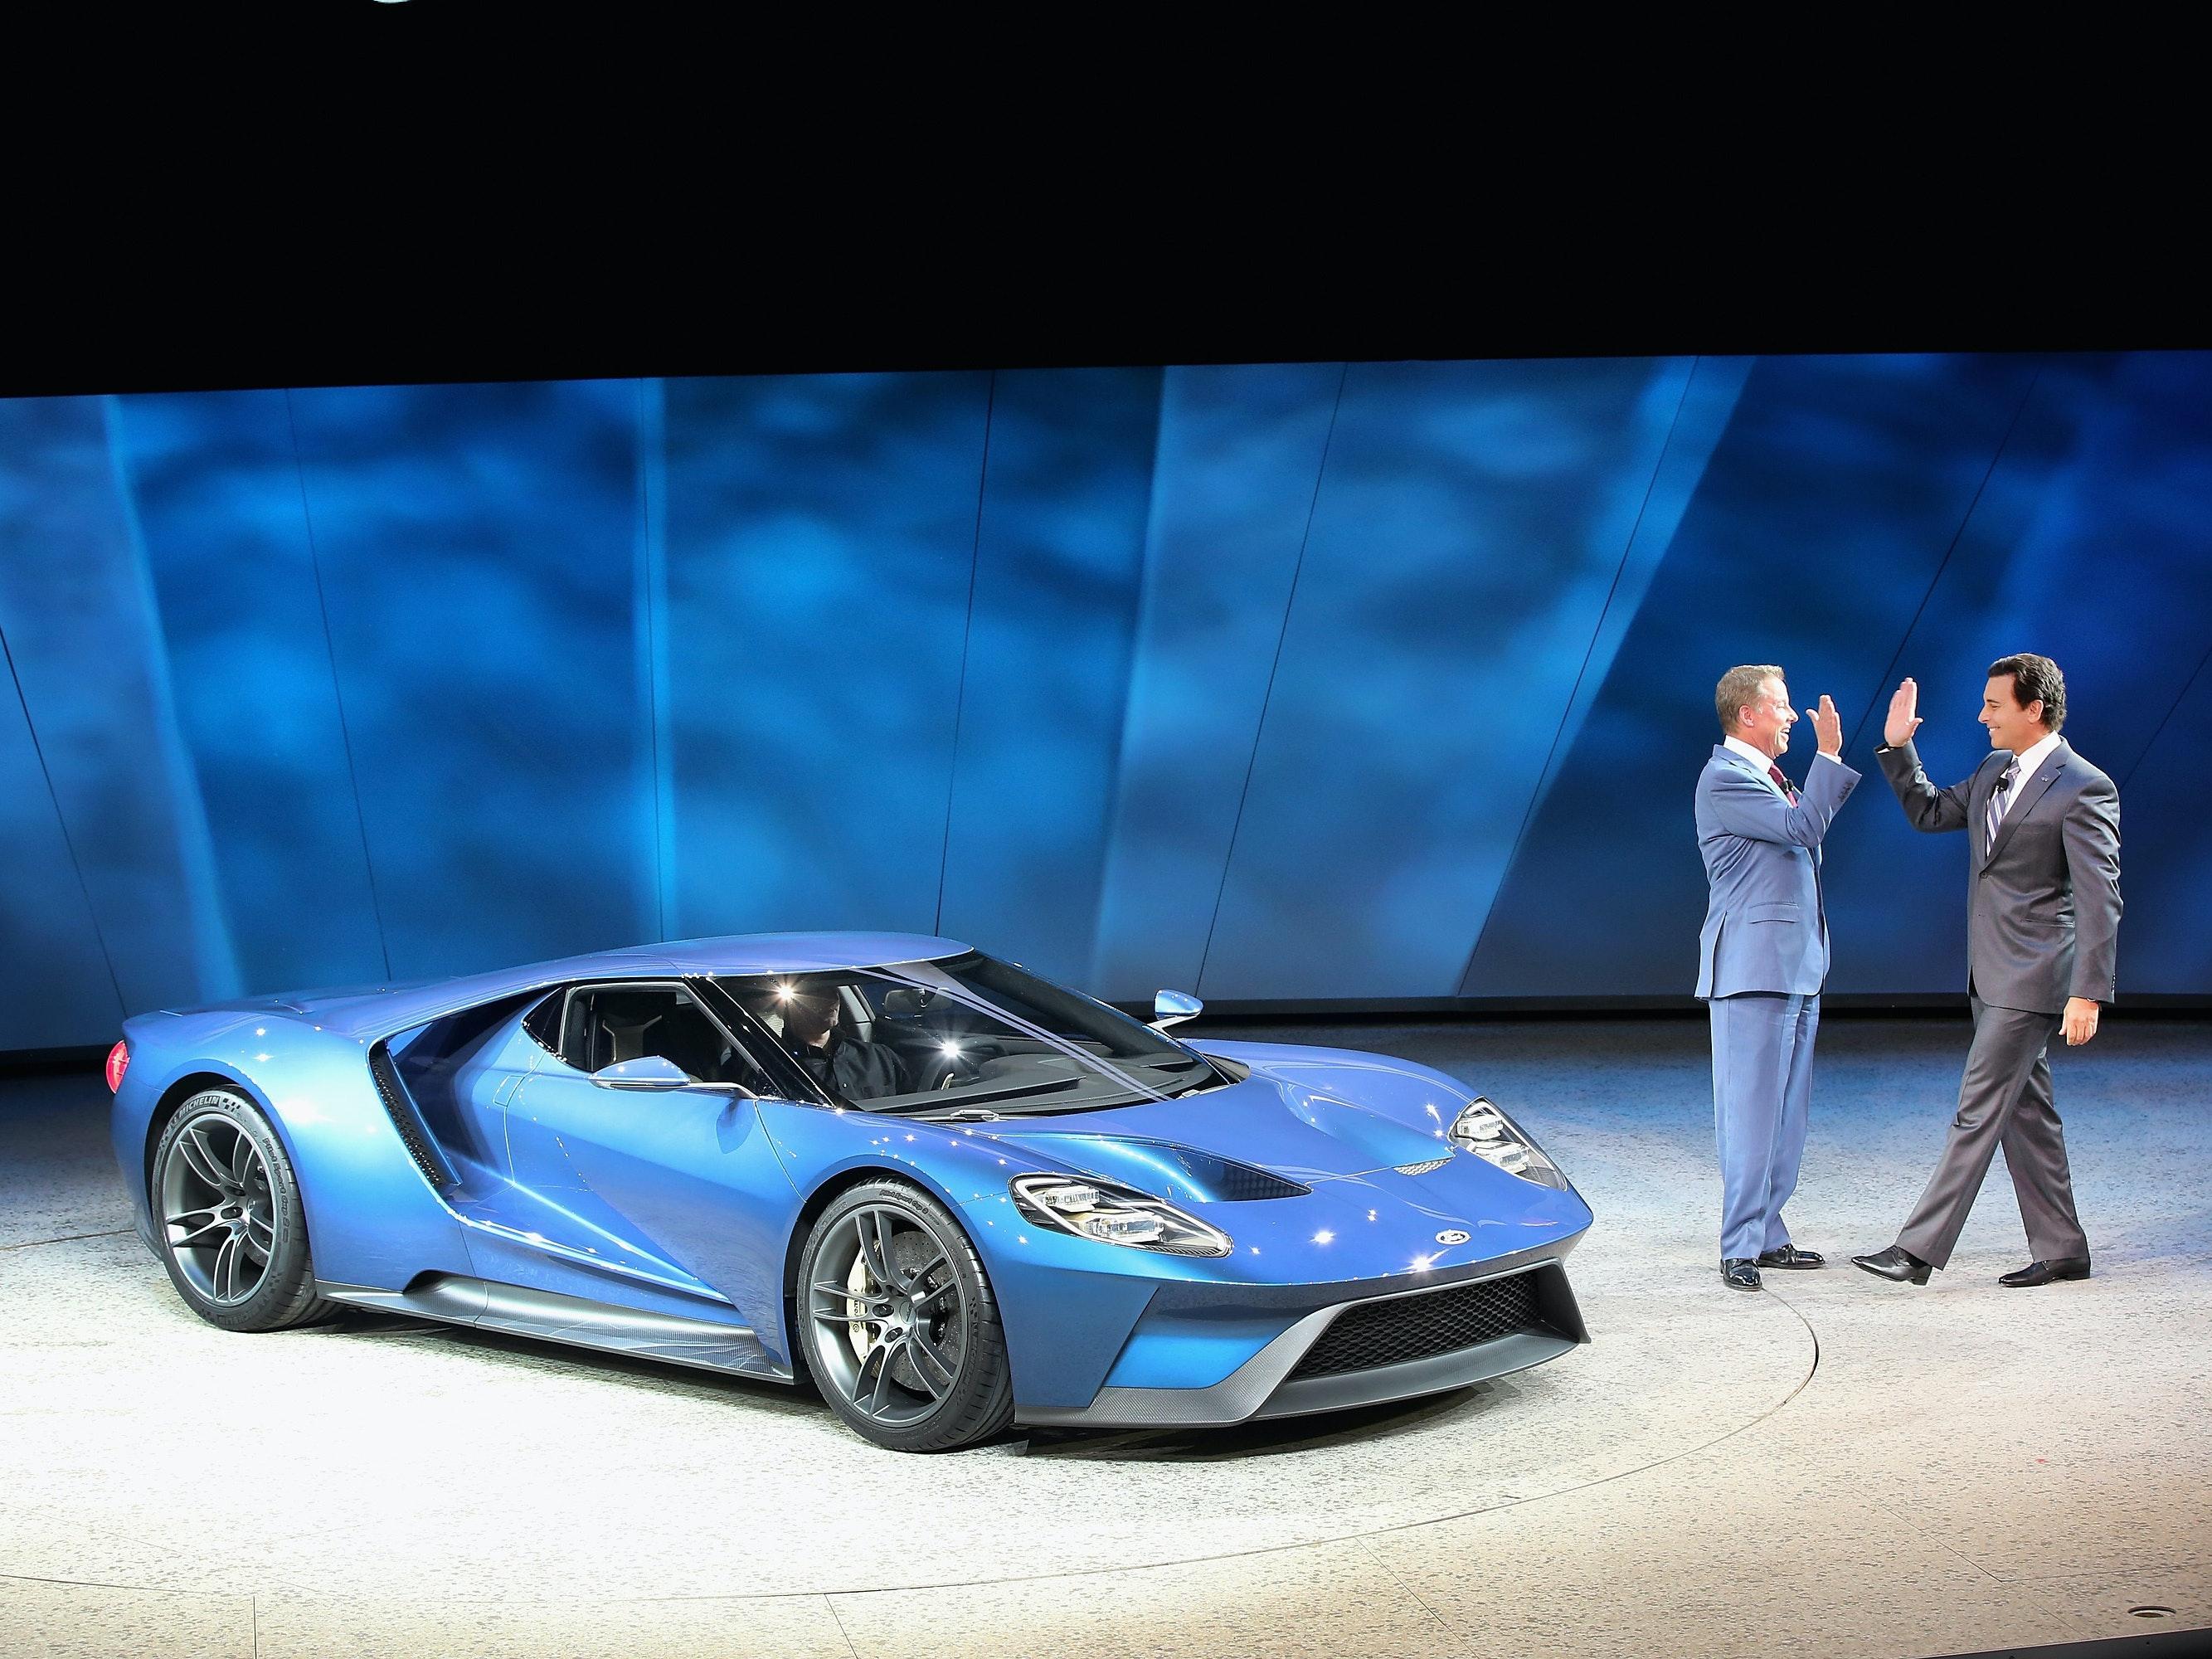 Ford Futurist: Autonomous Cars Can Save the American Dream